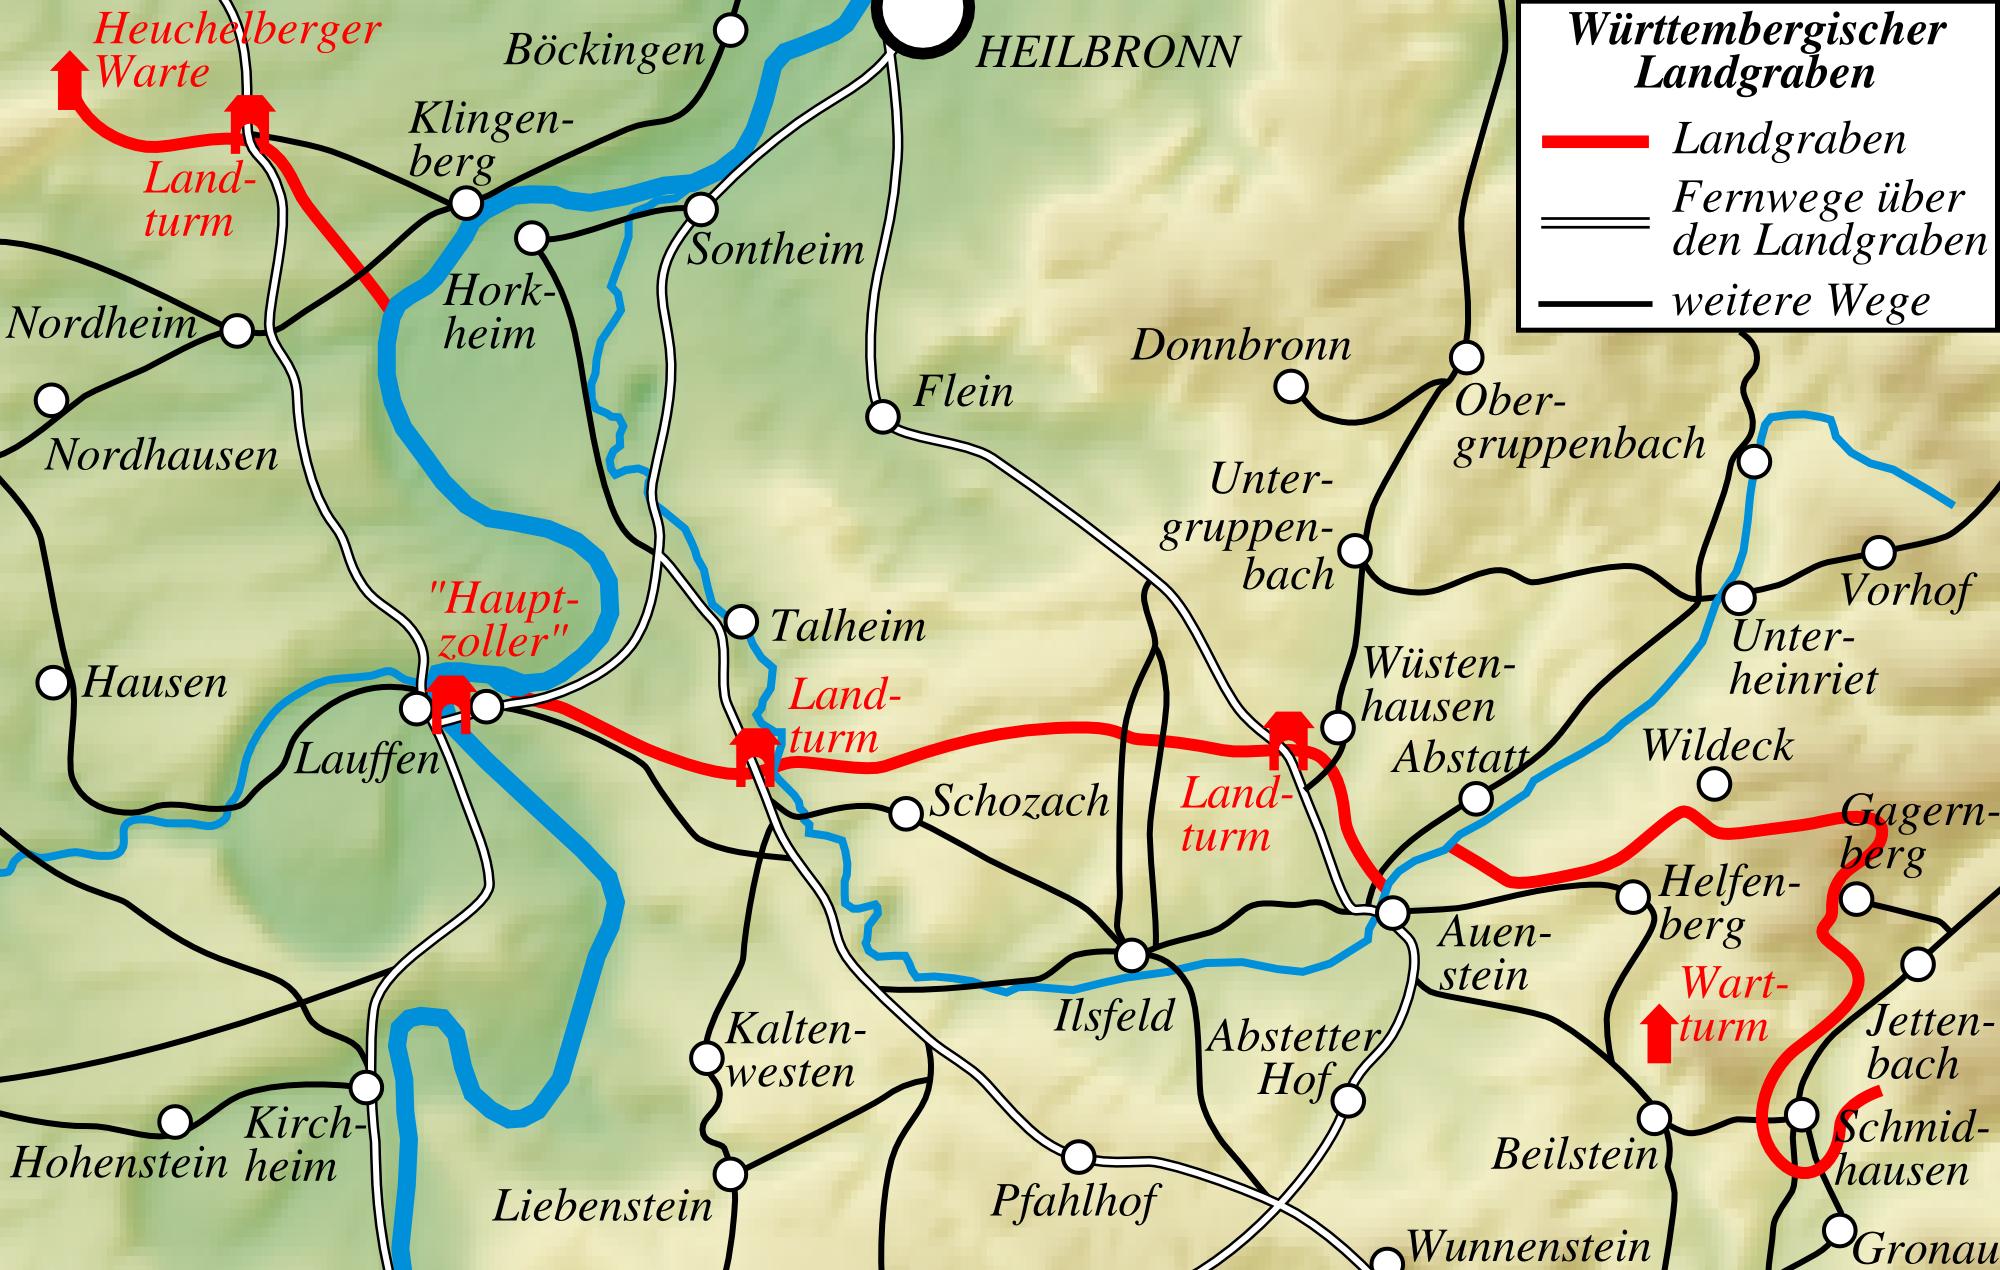 Bach Nordhausen file karte württembergischer landgraben png wikimedia commons